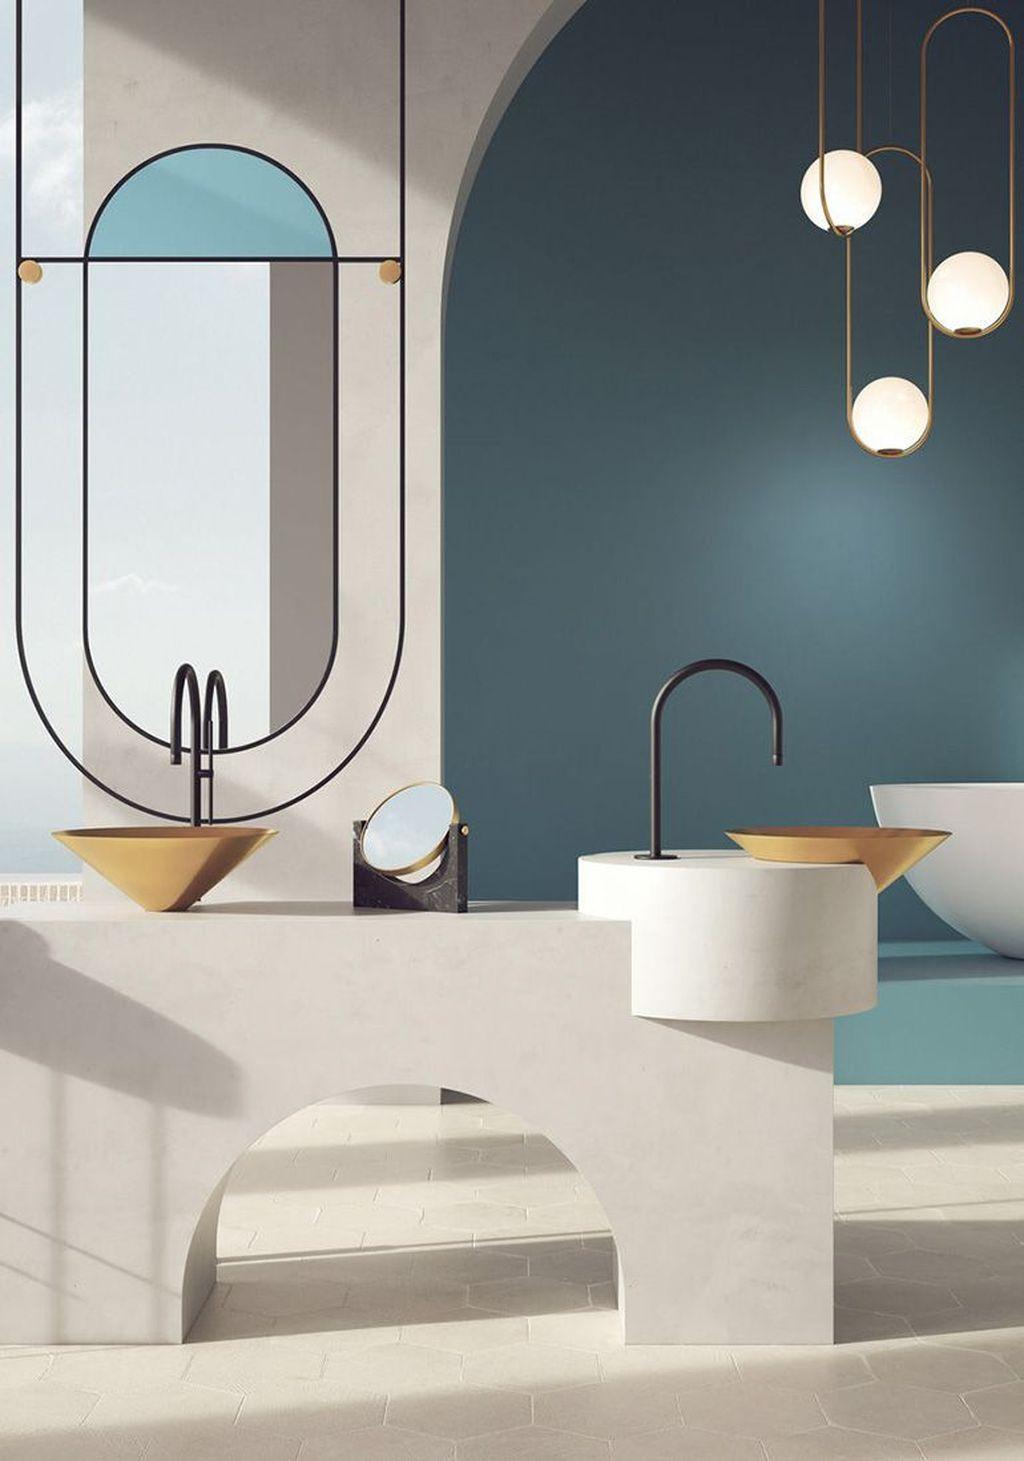 Unusual Bathroom Design Ideas You Need To Know 16